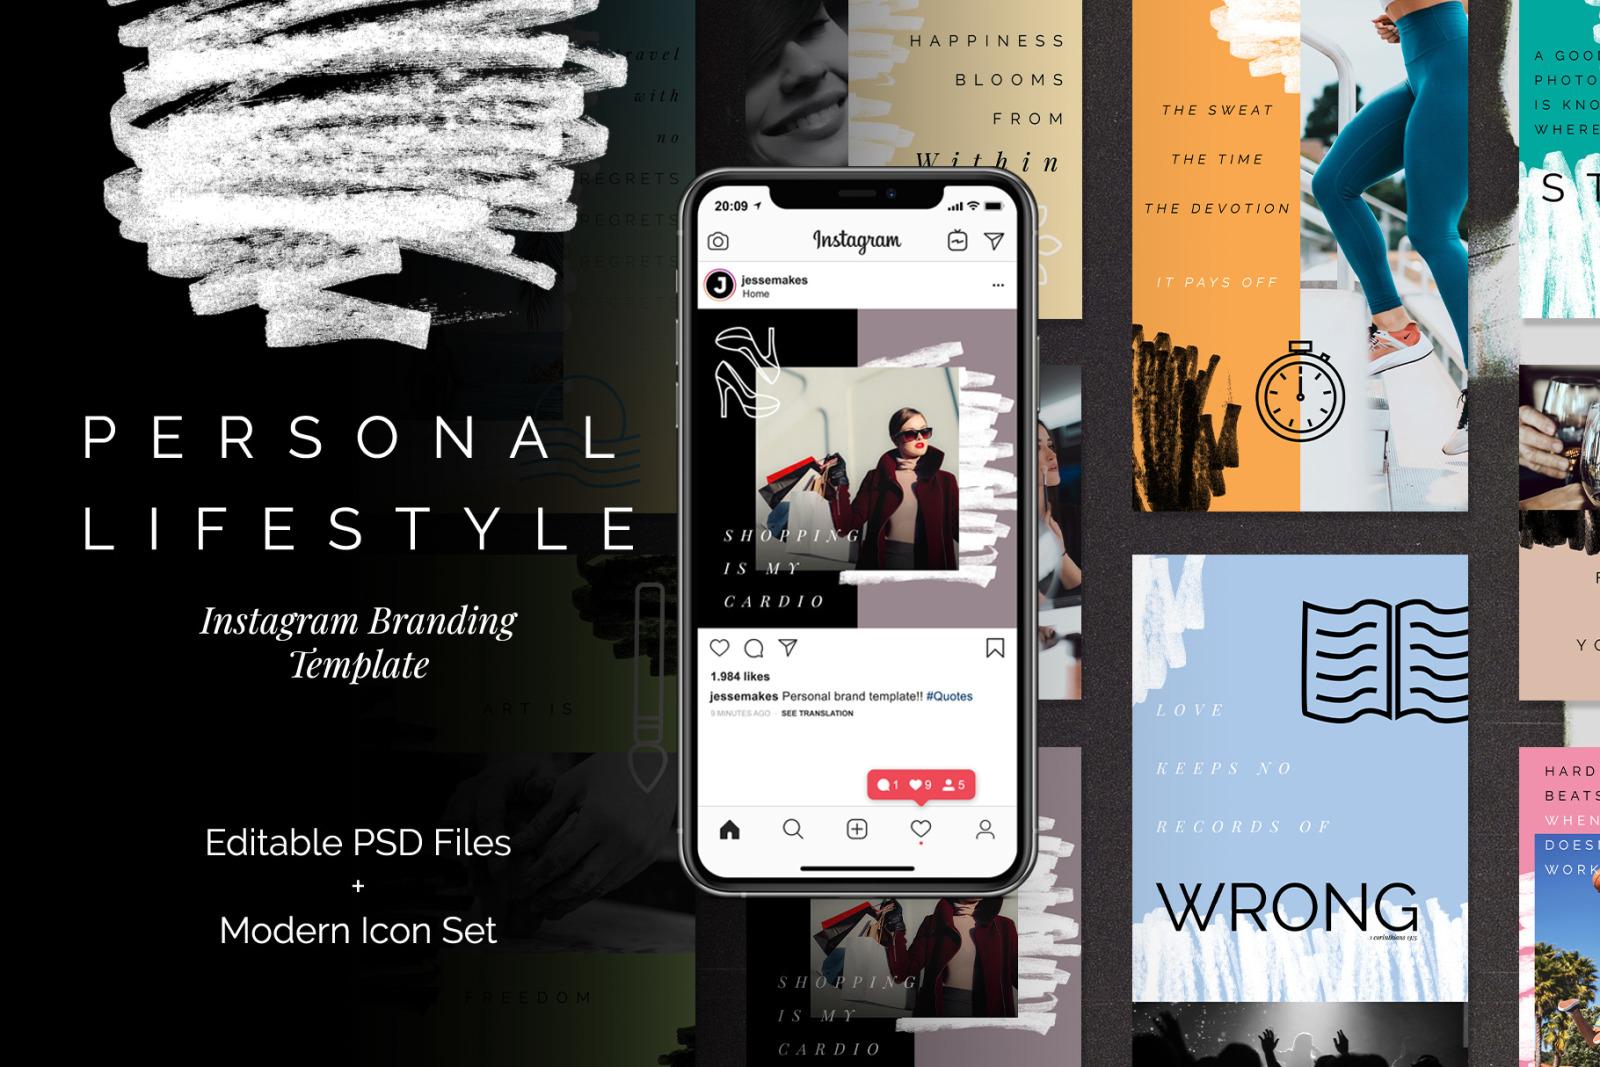 Download Instagram Story Mockup Free Psd PSD - Free PSD Mockup Templates